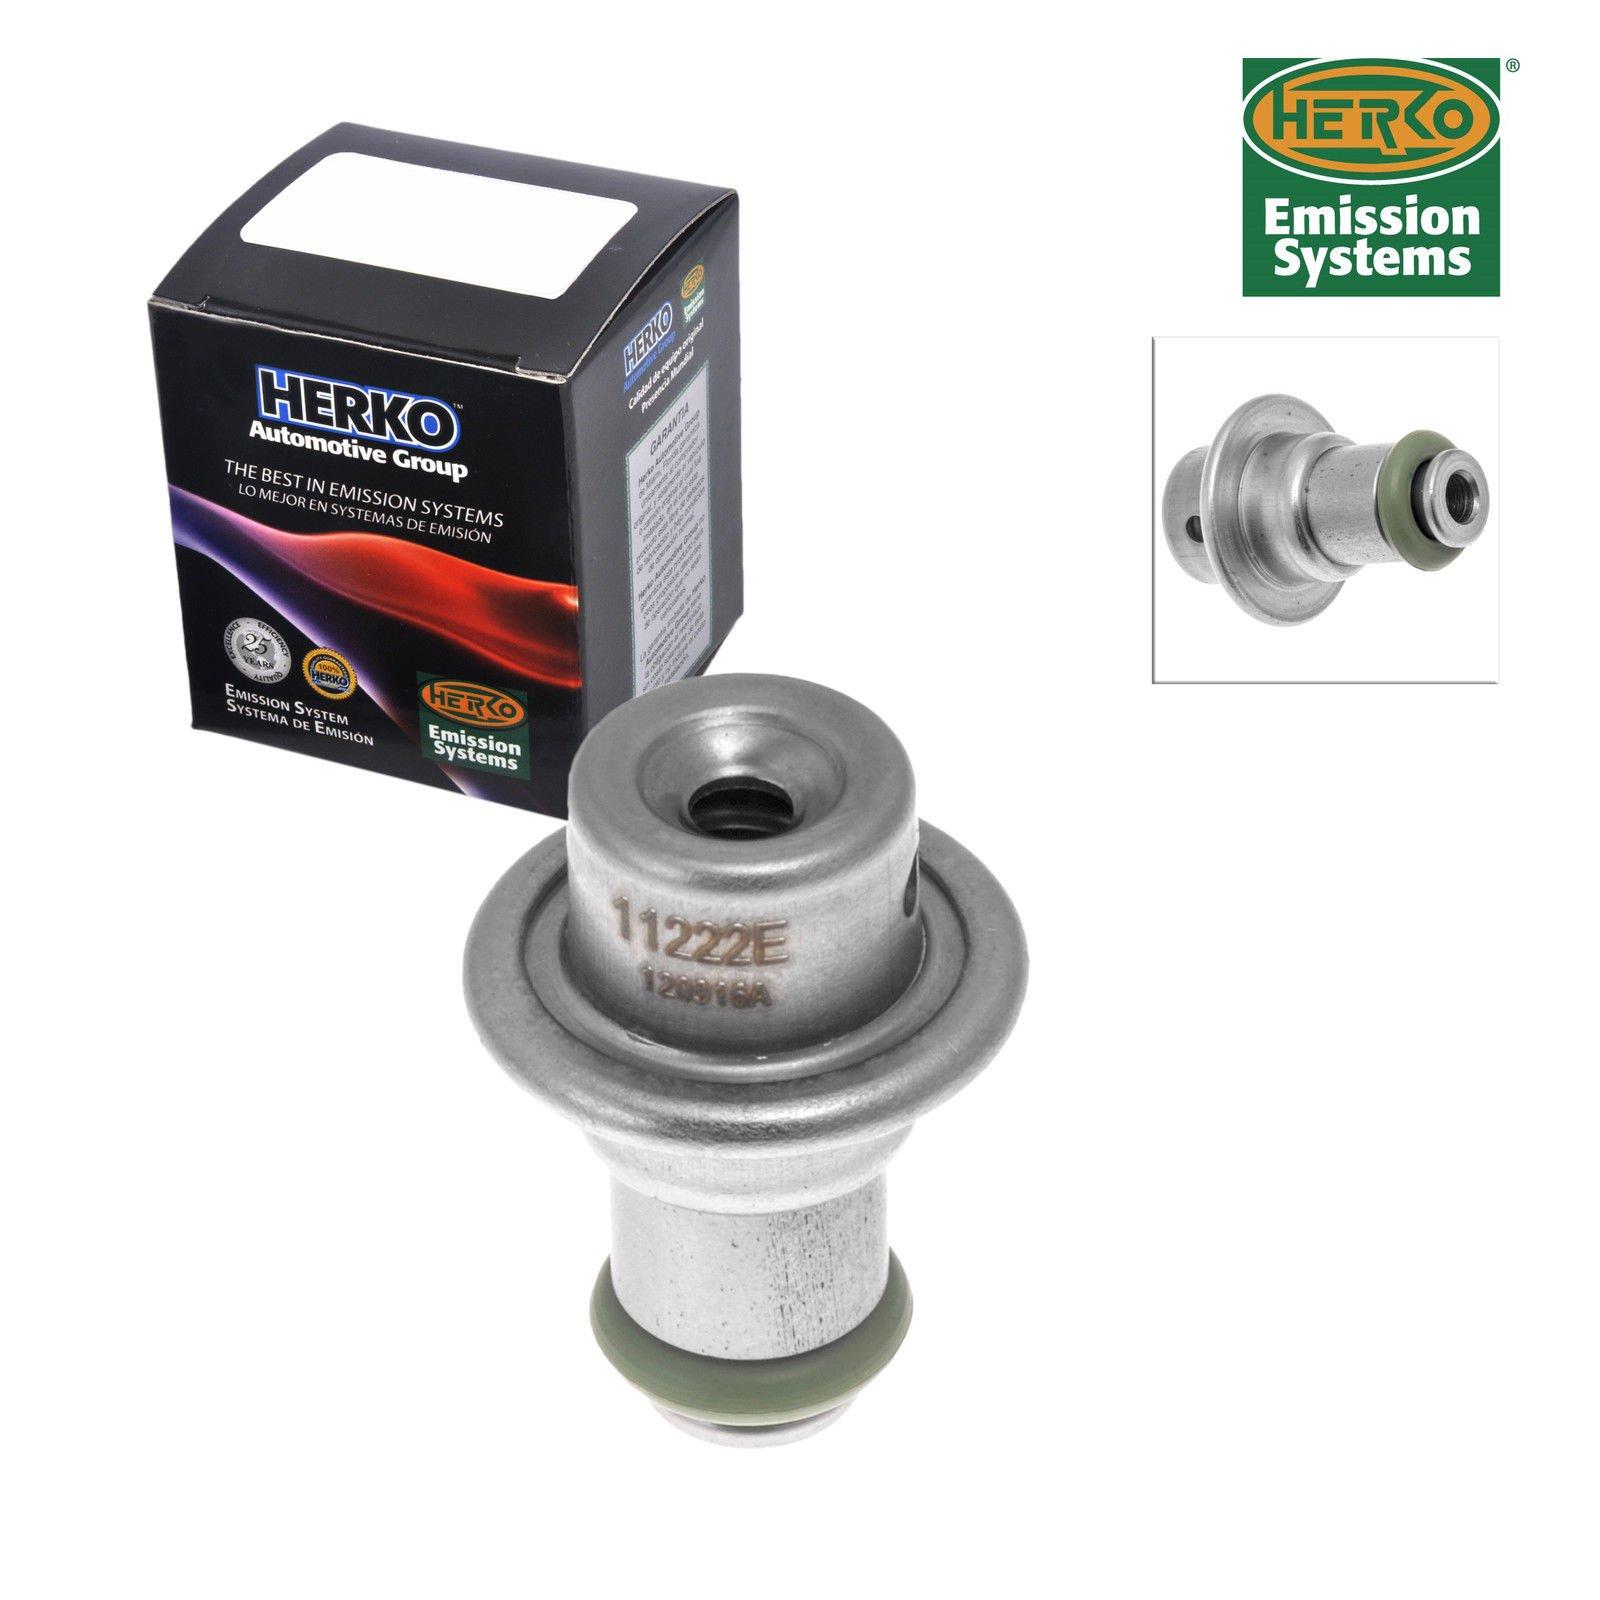 AD Auto Parts New Herko Fuel Pressure Regulator PR4129 for Toyota 1998-2012